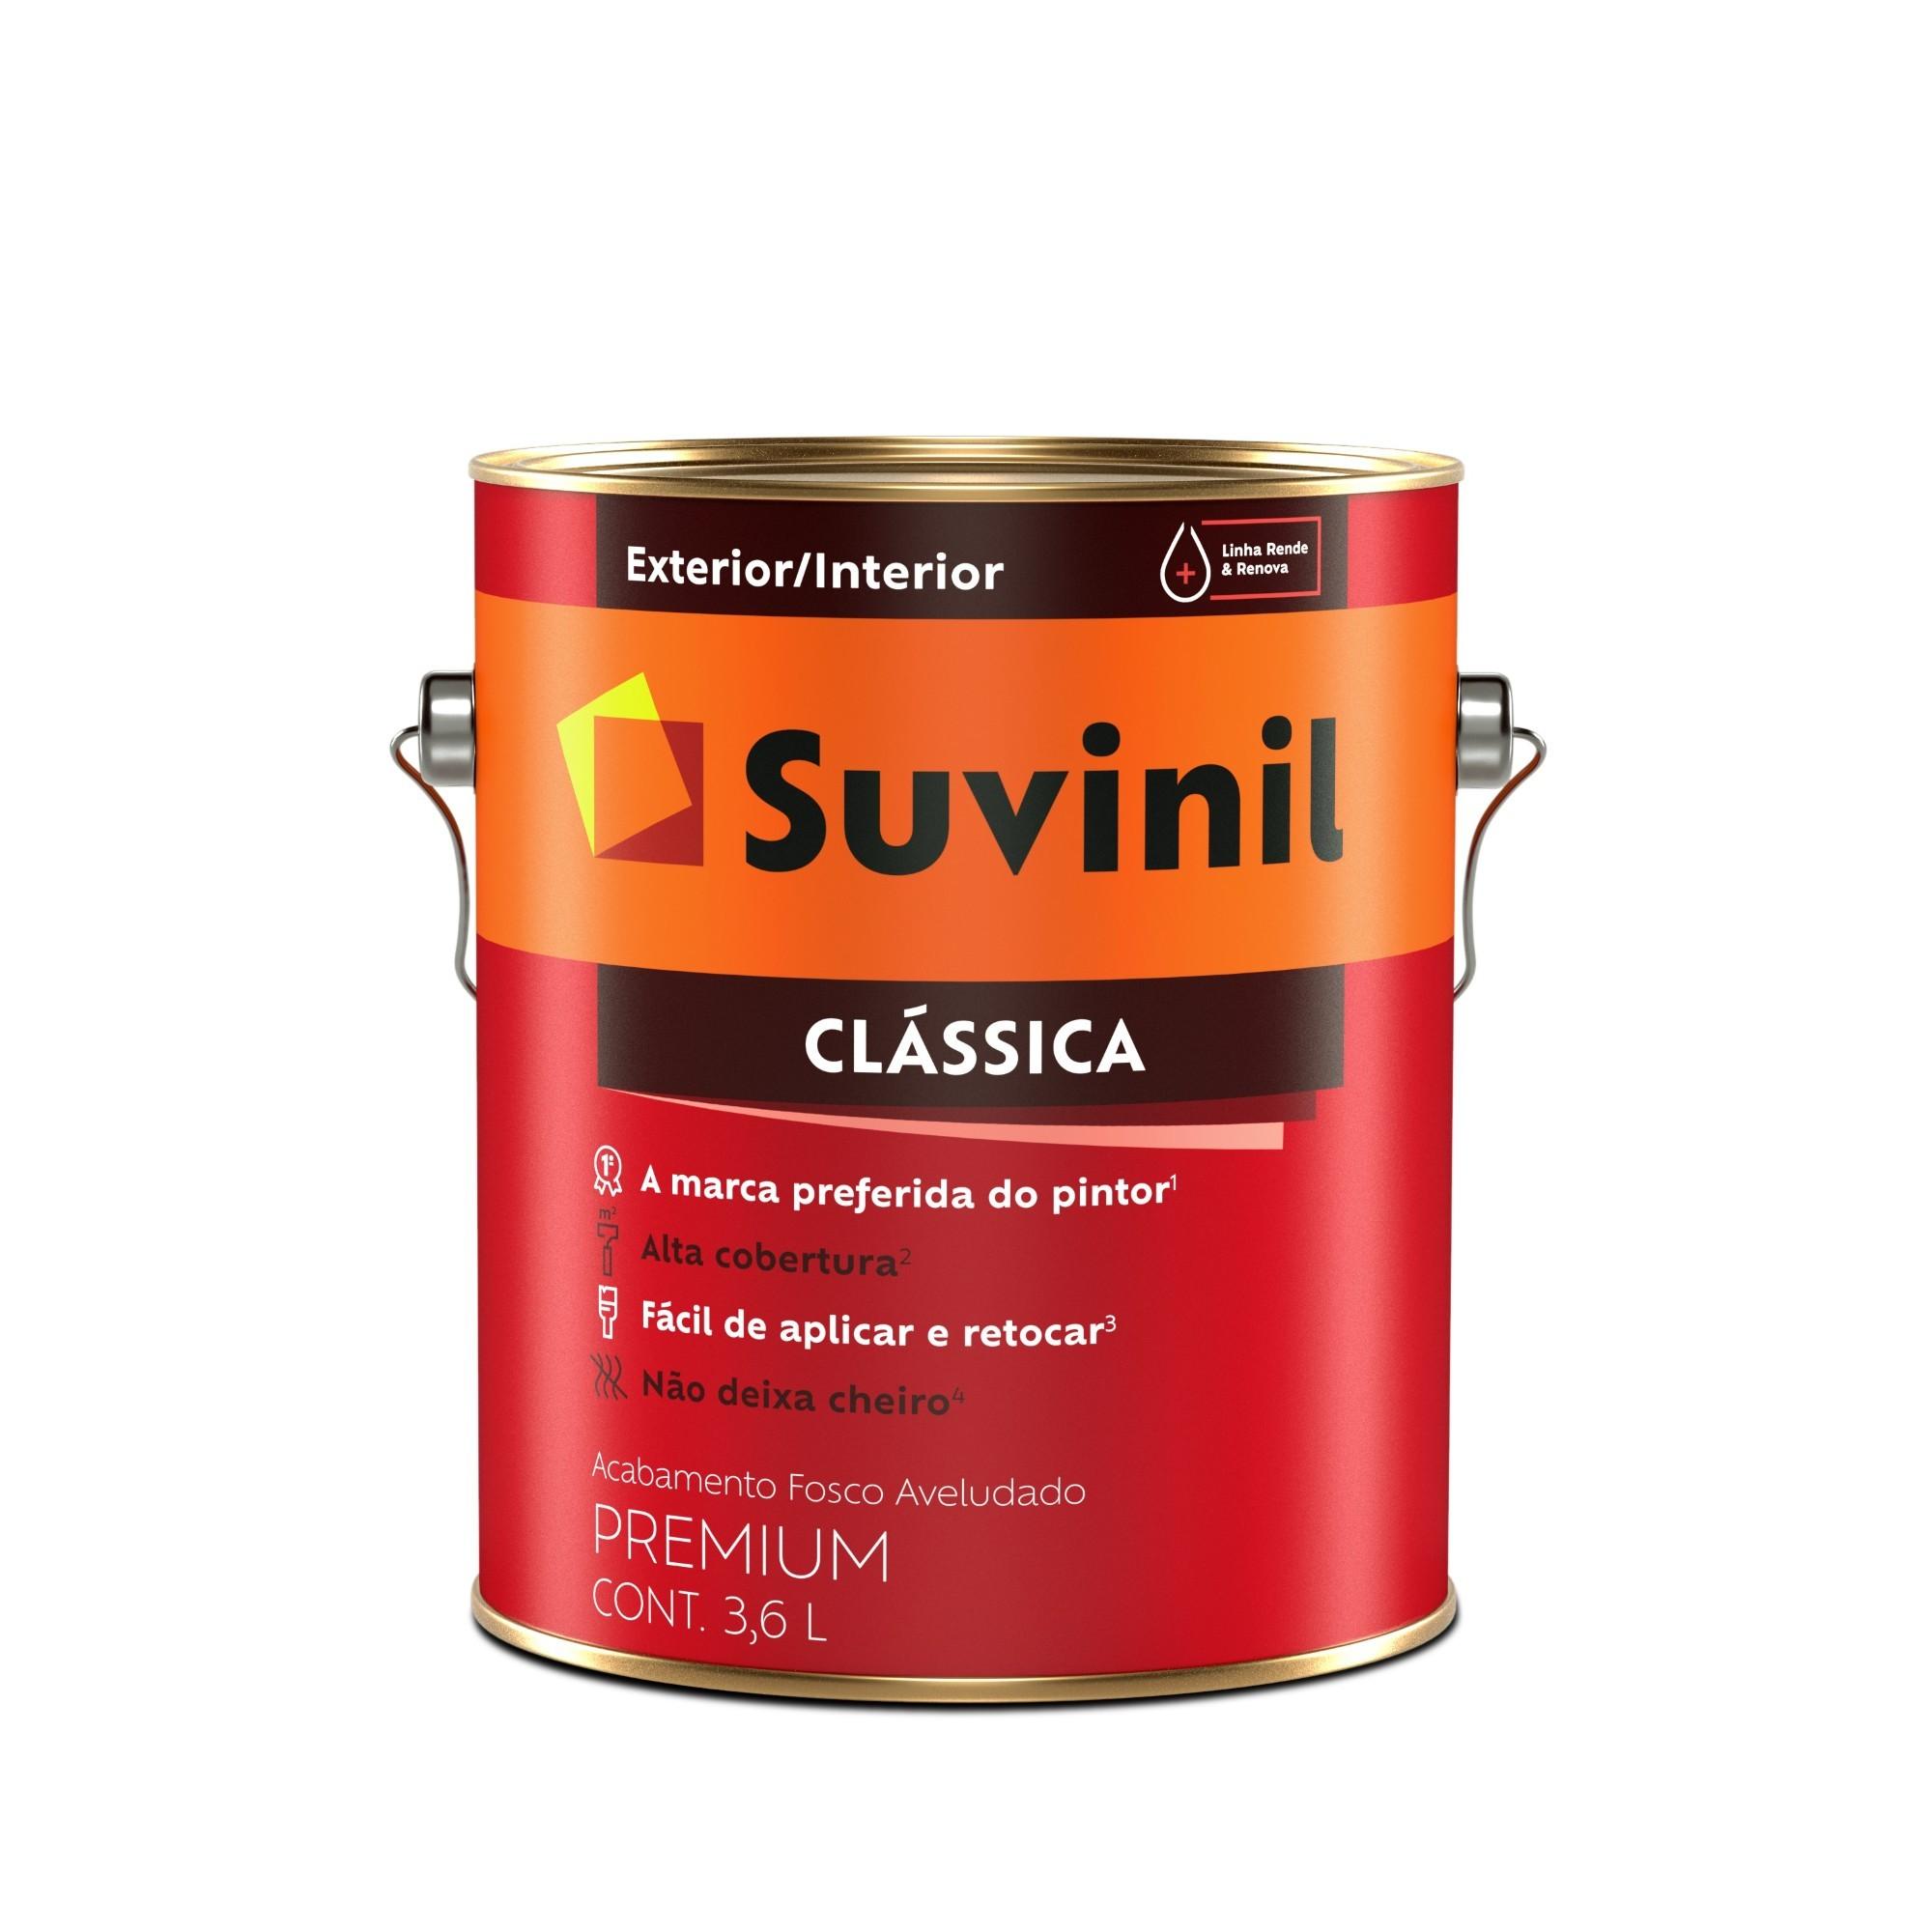 Tinta Pva Fosco Premium 36L - Branco Neve - Maxx Suvinil